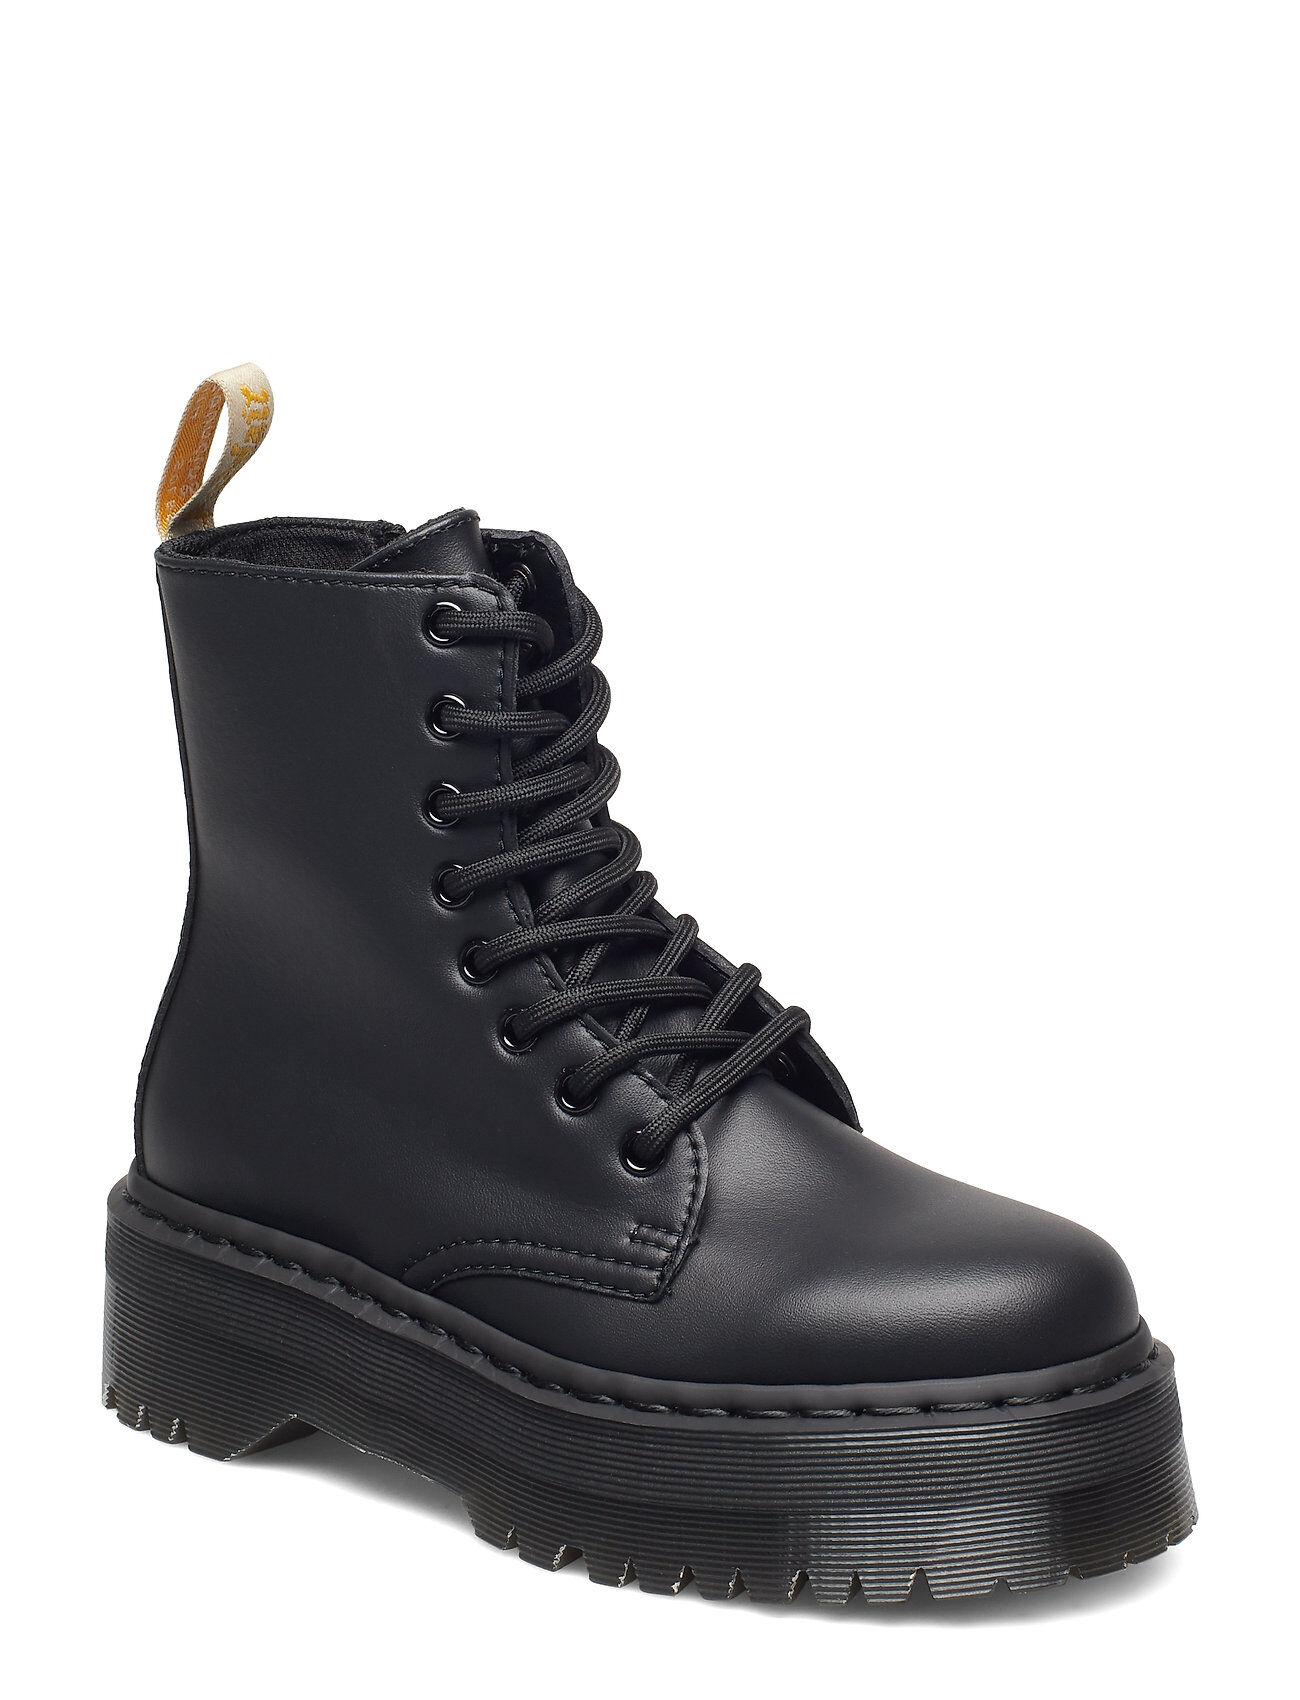 Image of Dr. Martens Jadon Vegan Mono Shoes Boots Ankle Boots Ankle Boots Flat Heel Musta Dr. Martens